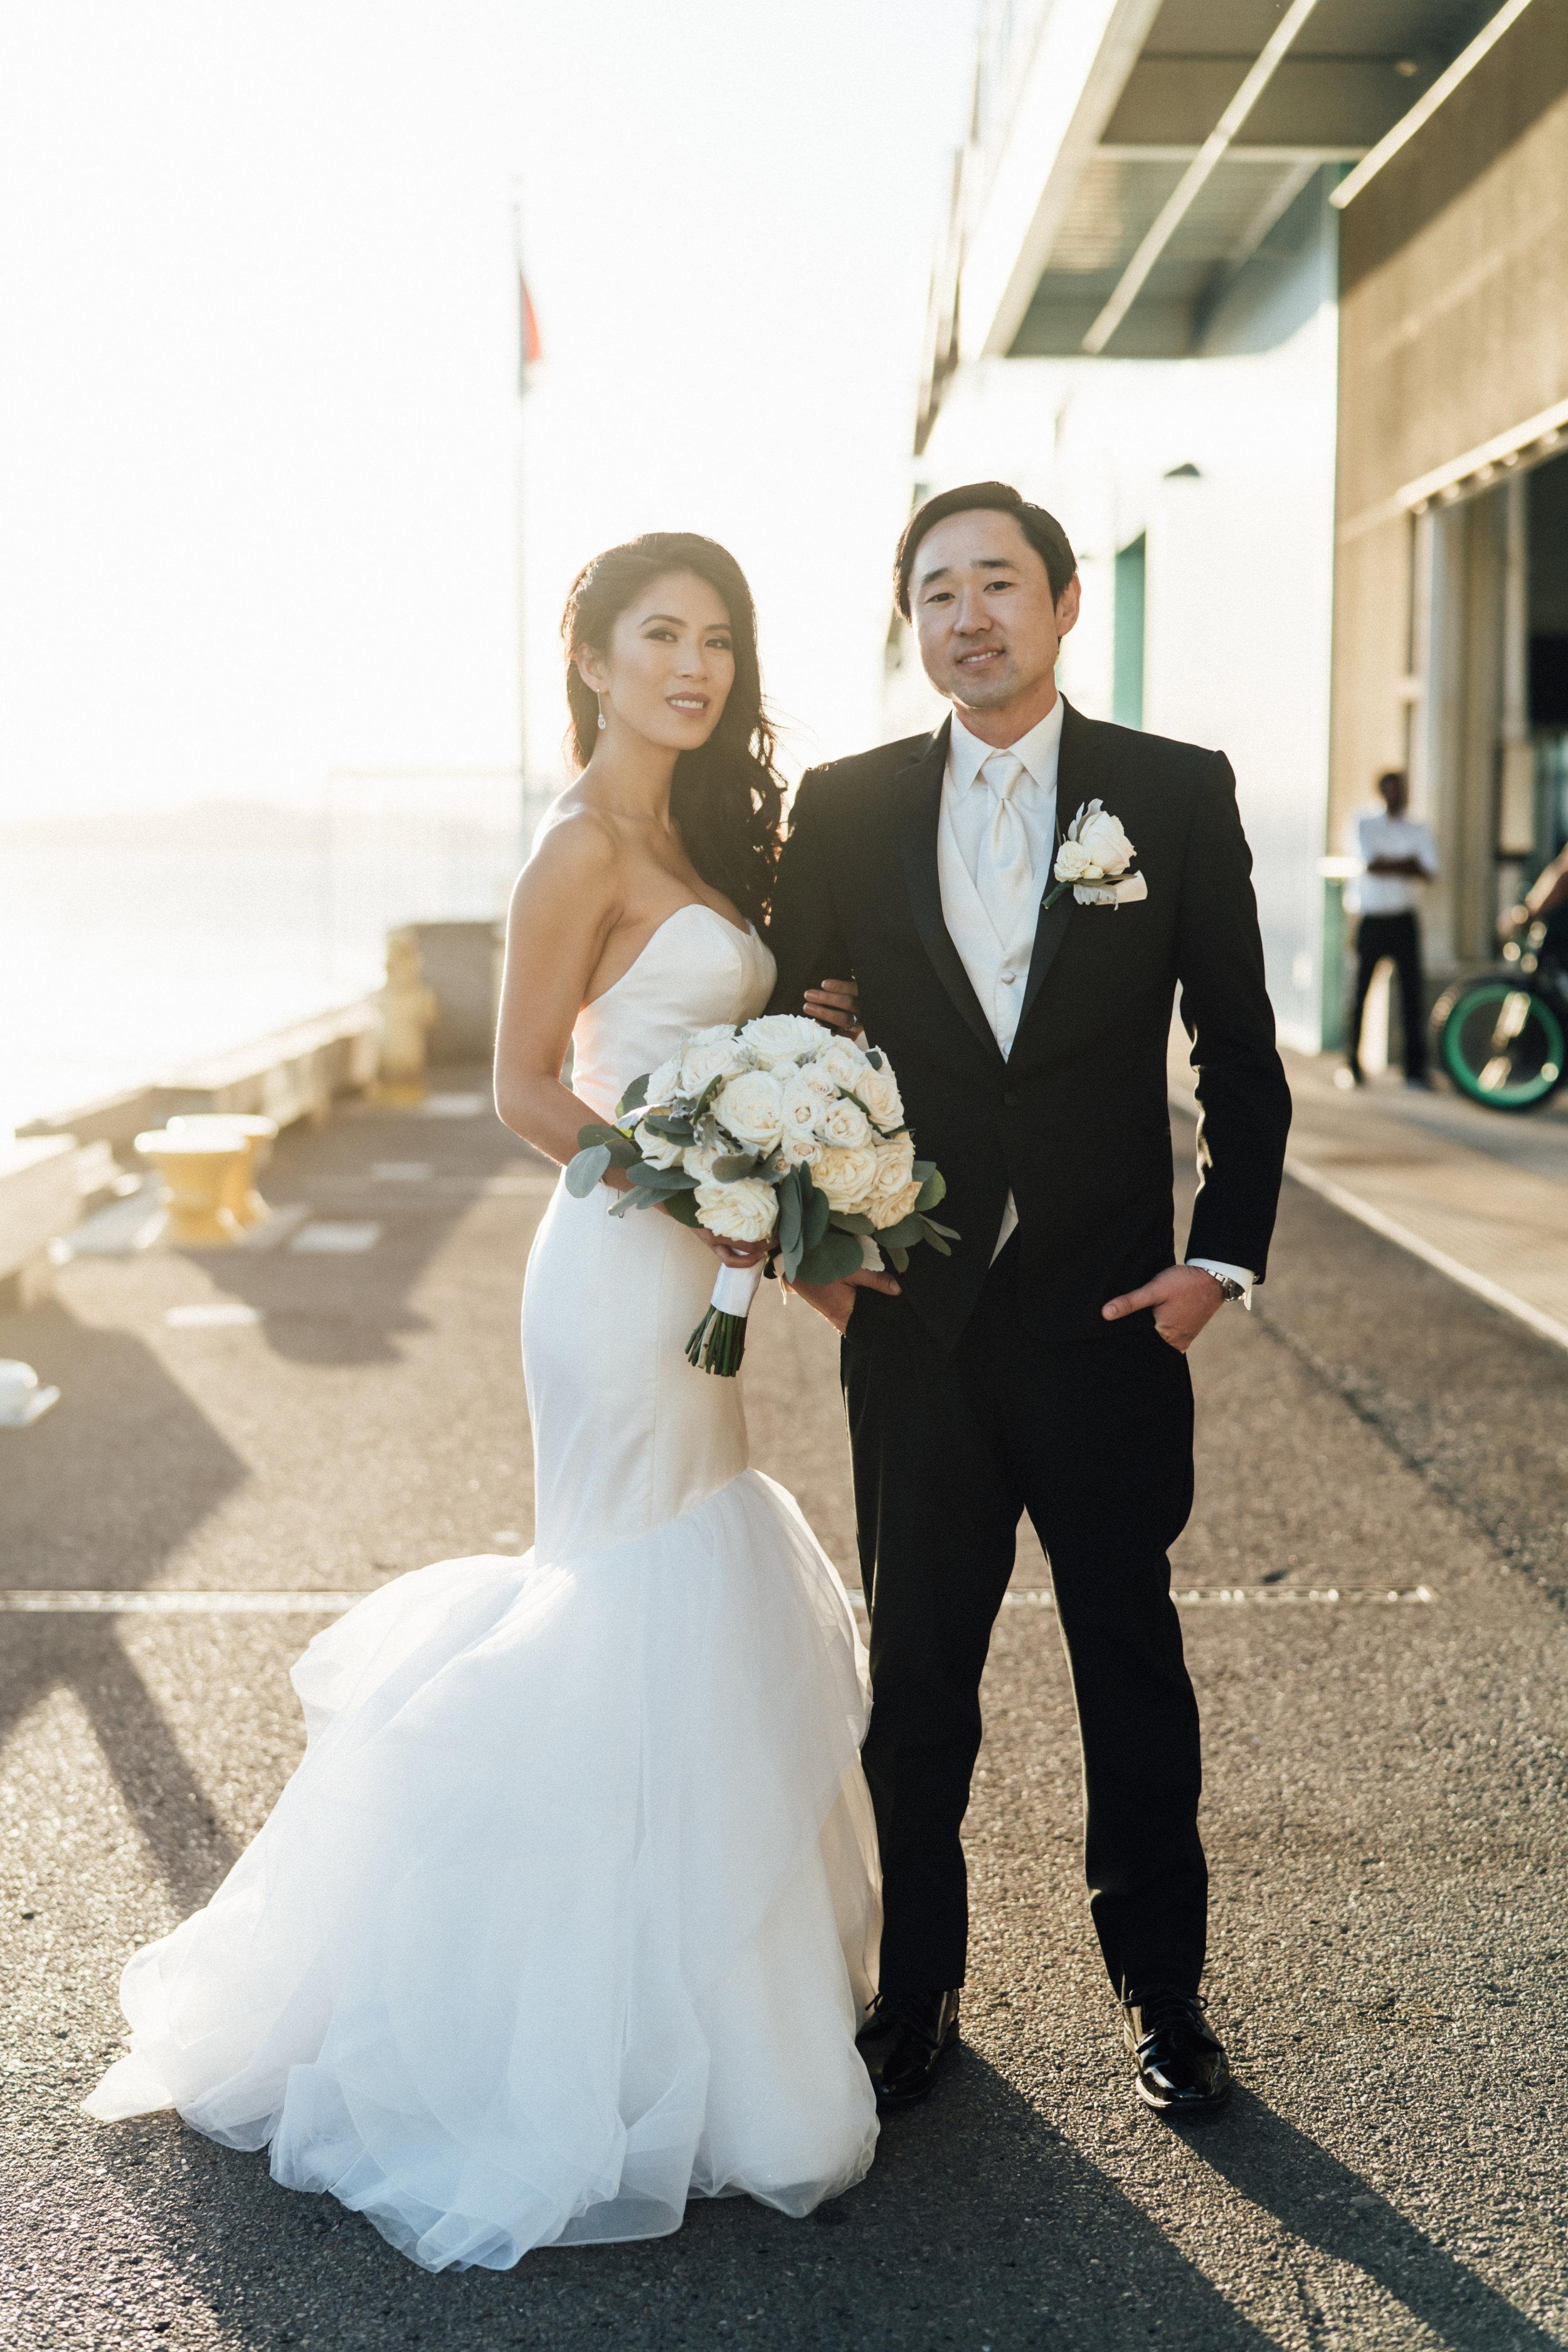 706 Anna _ Danny Wedding SUP08548.jpg